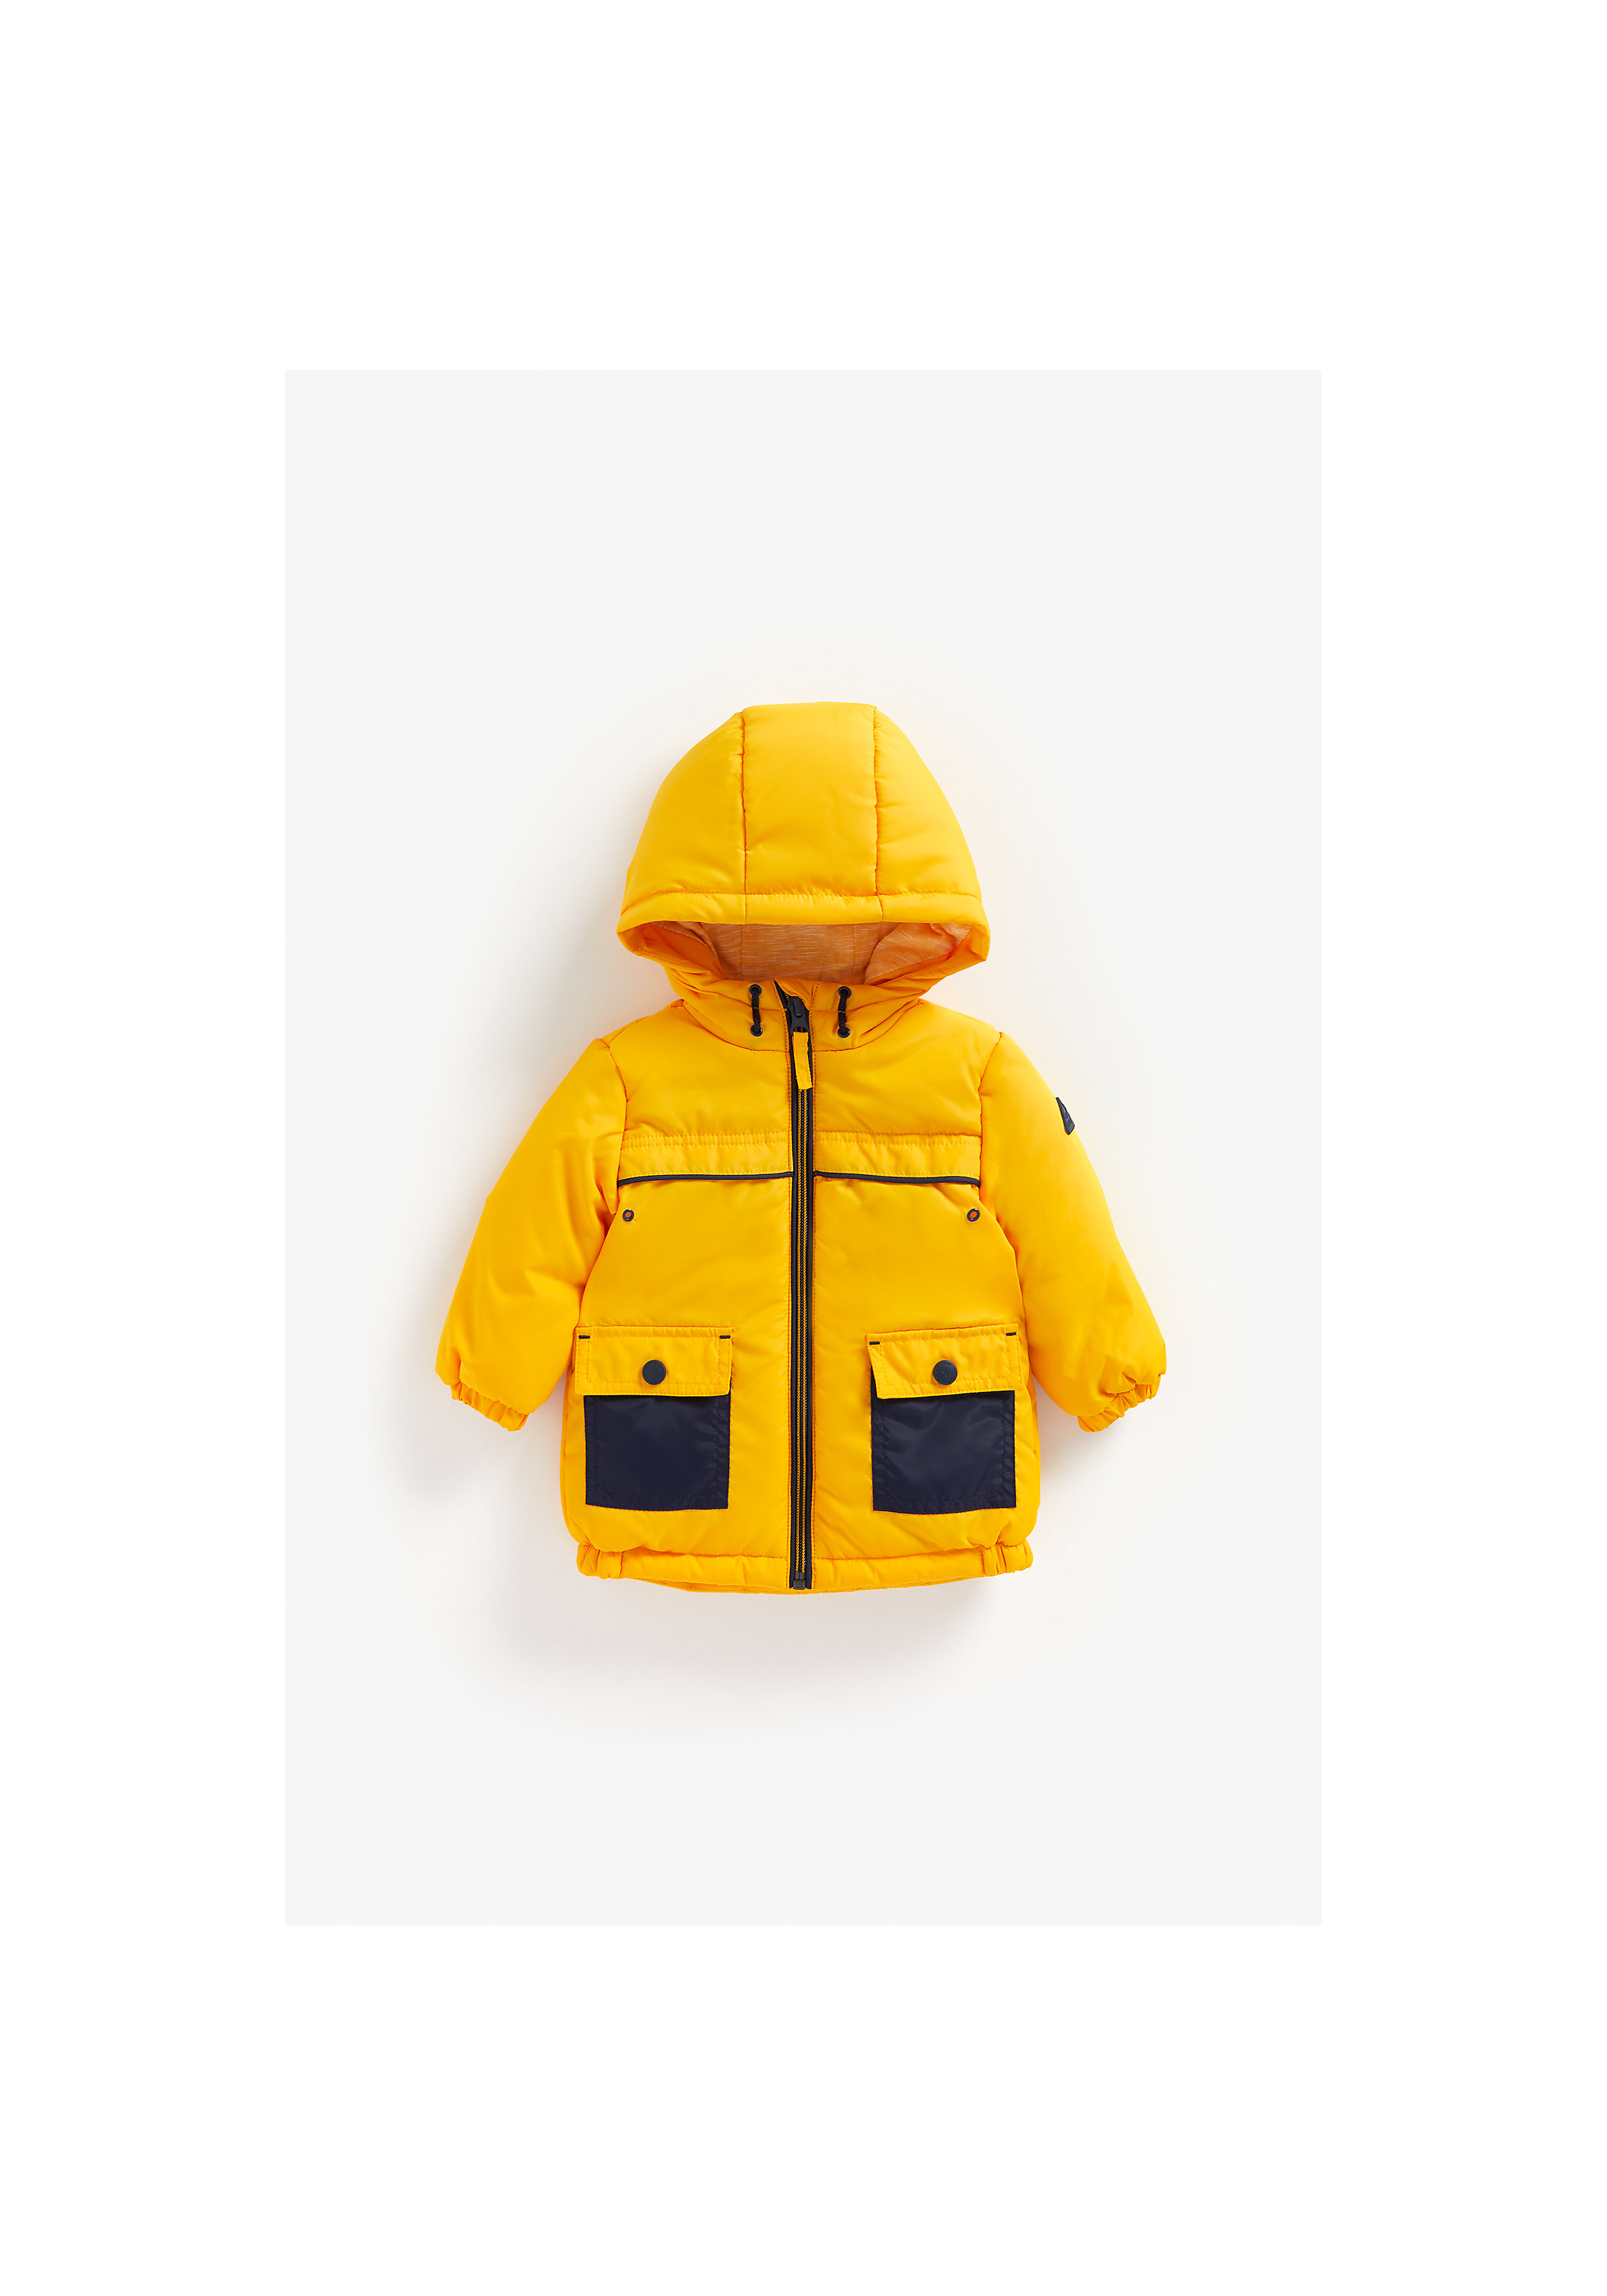 Mothercare | Boys Full Sleeves Fleece Lined Jacket Pocket Detail - Yellow